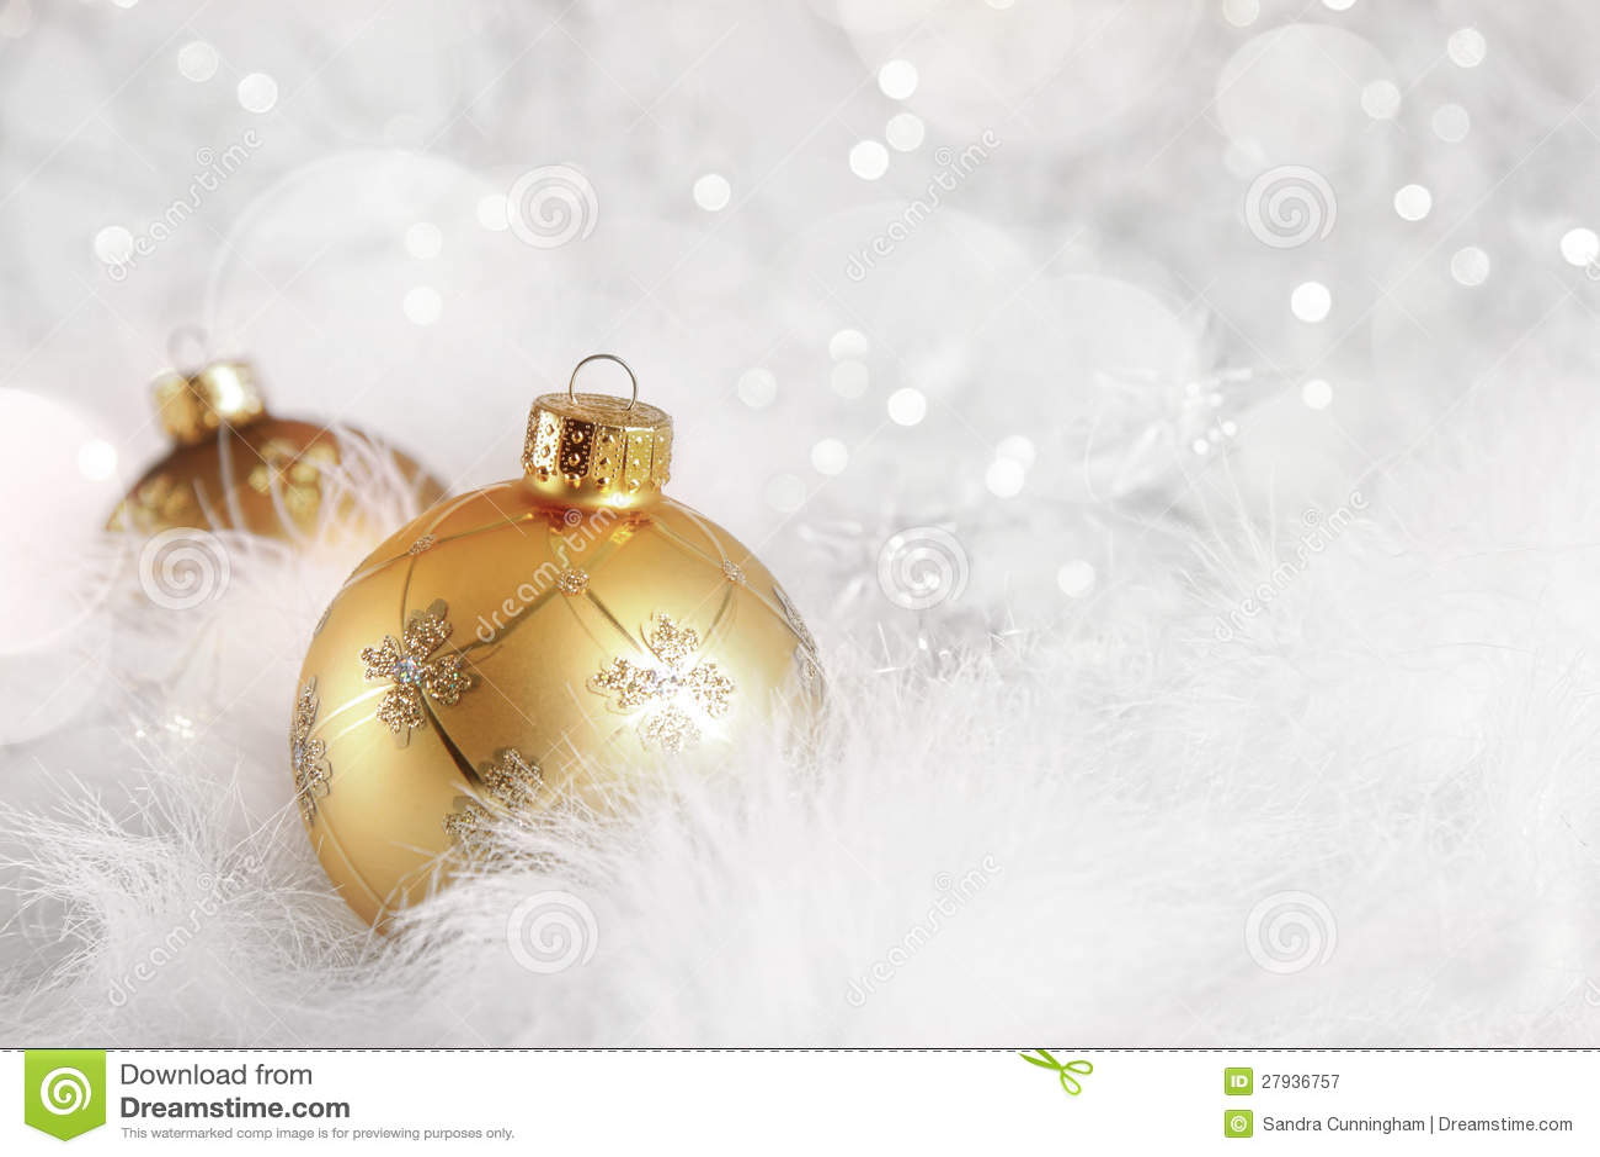 Golden Christmas Balls On Holiday Background Stock Image Image Of Christmas Celebrate 27936757